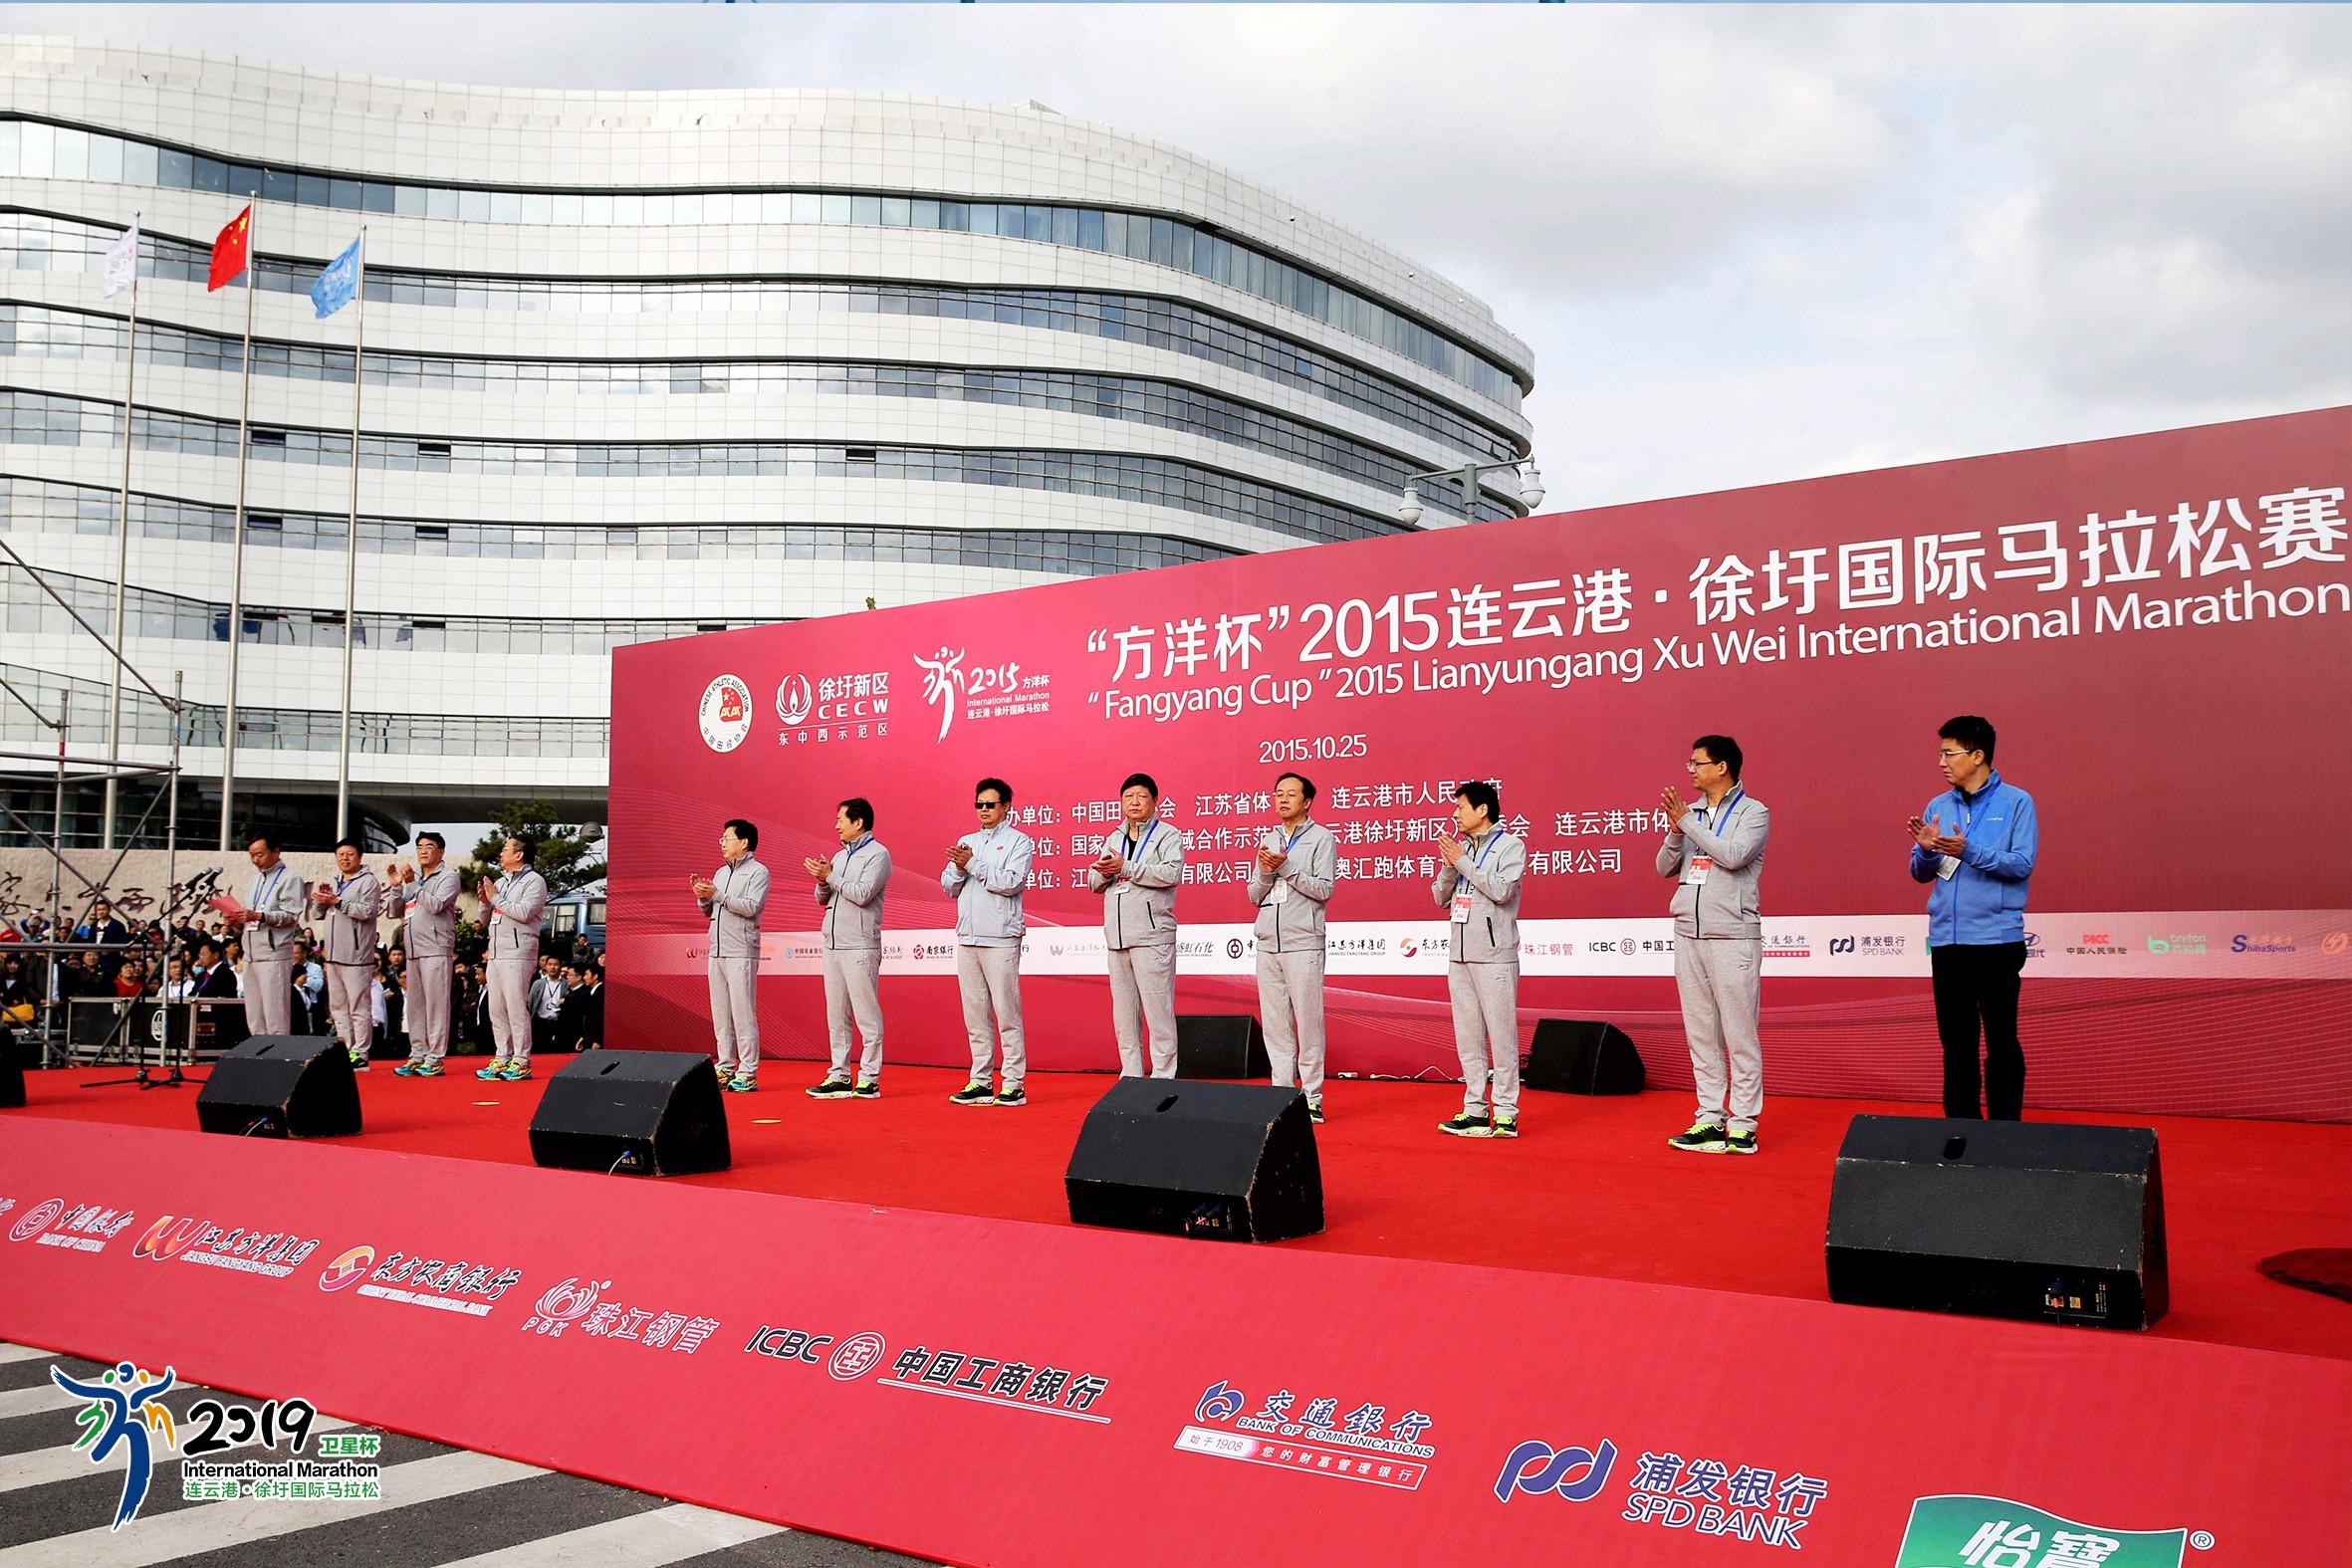 http://img.sport-china.cn/190712155d283435e71d5.jpeg